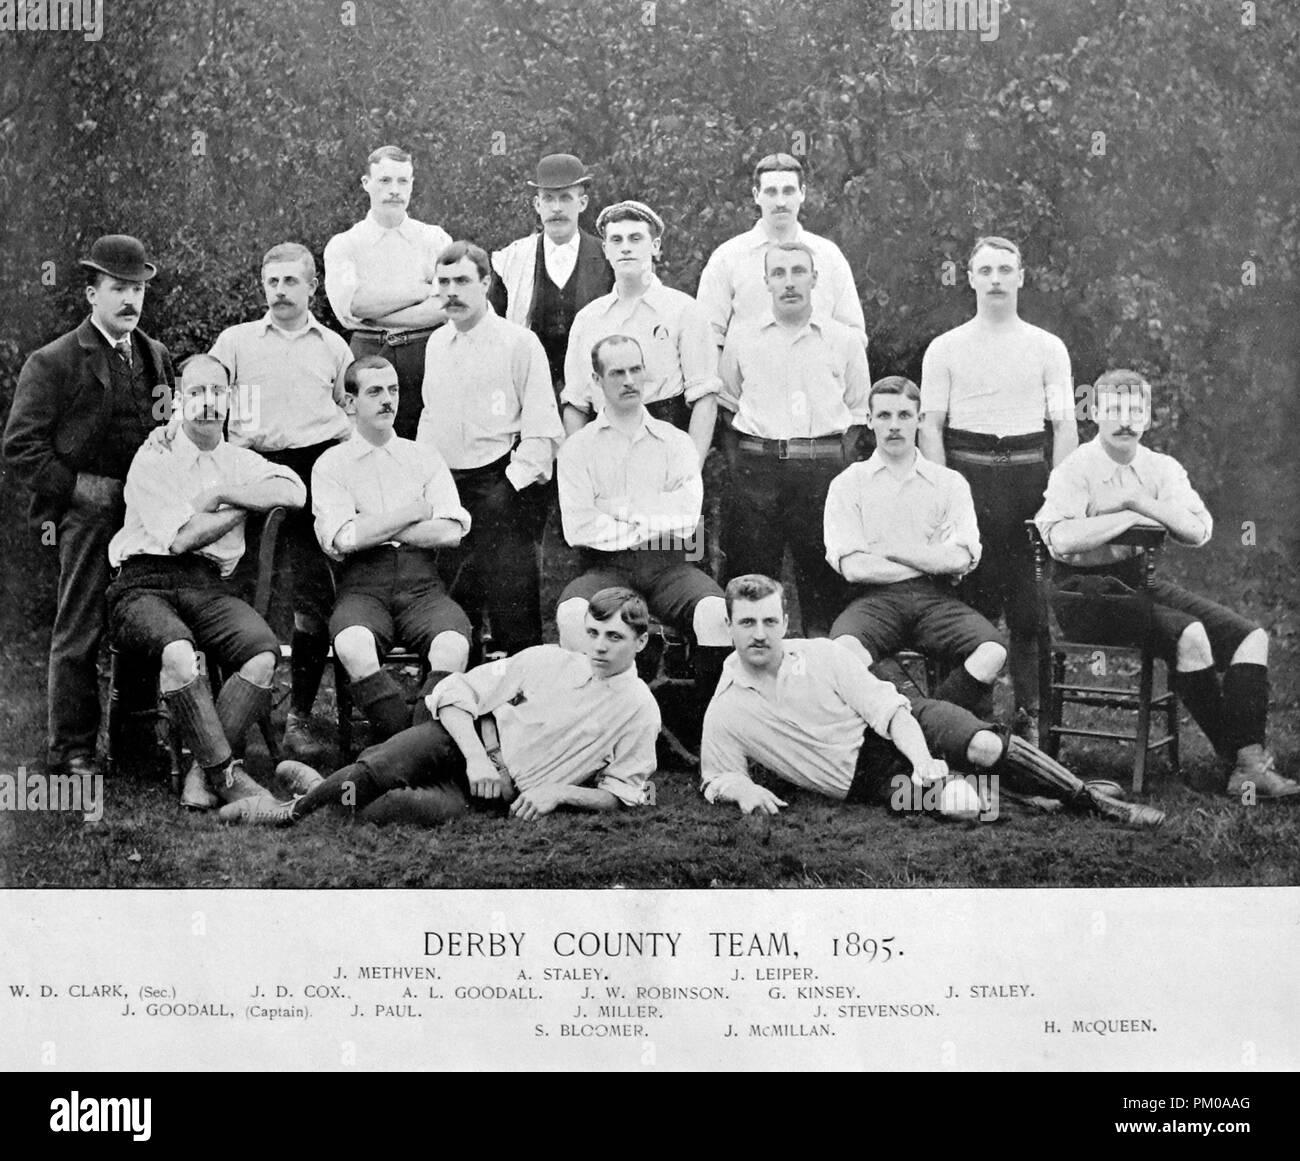 Derby County Football Team 1895 Stock Photo Alamy